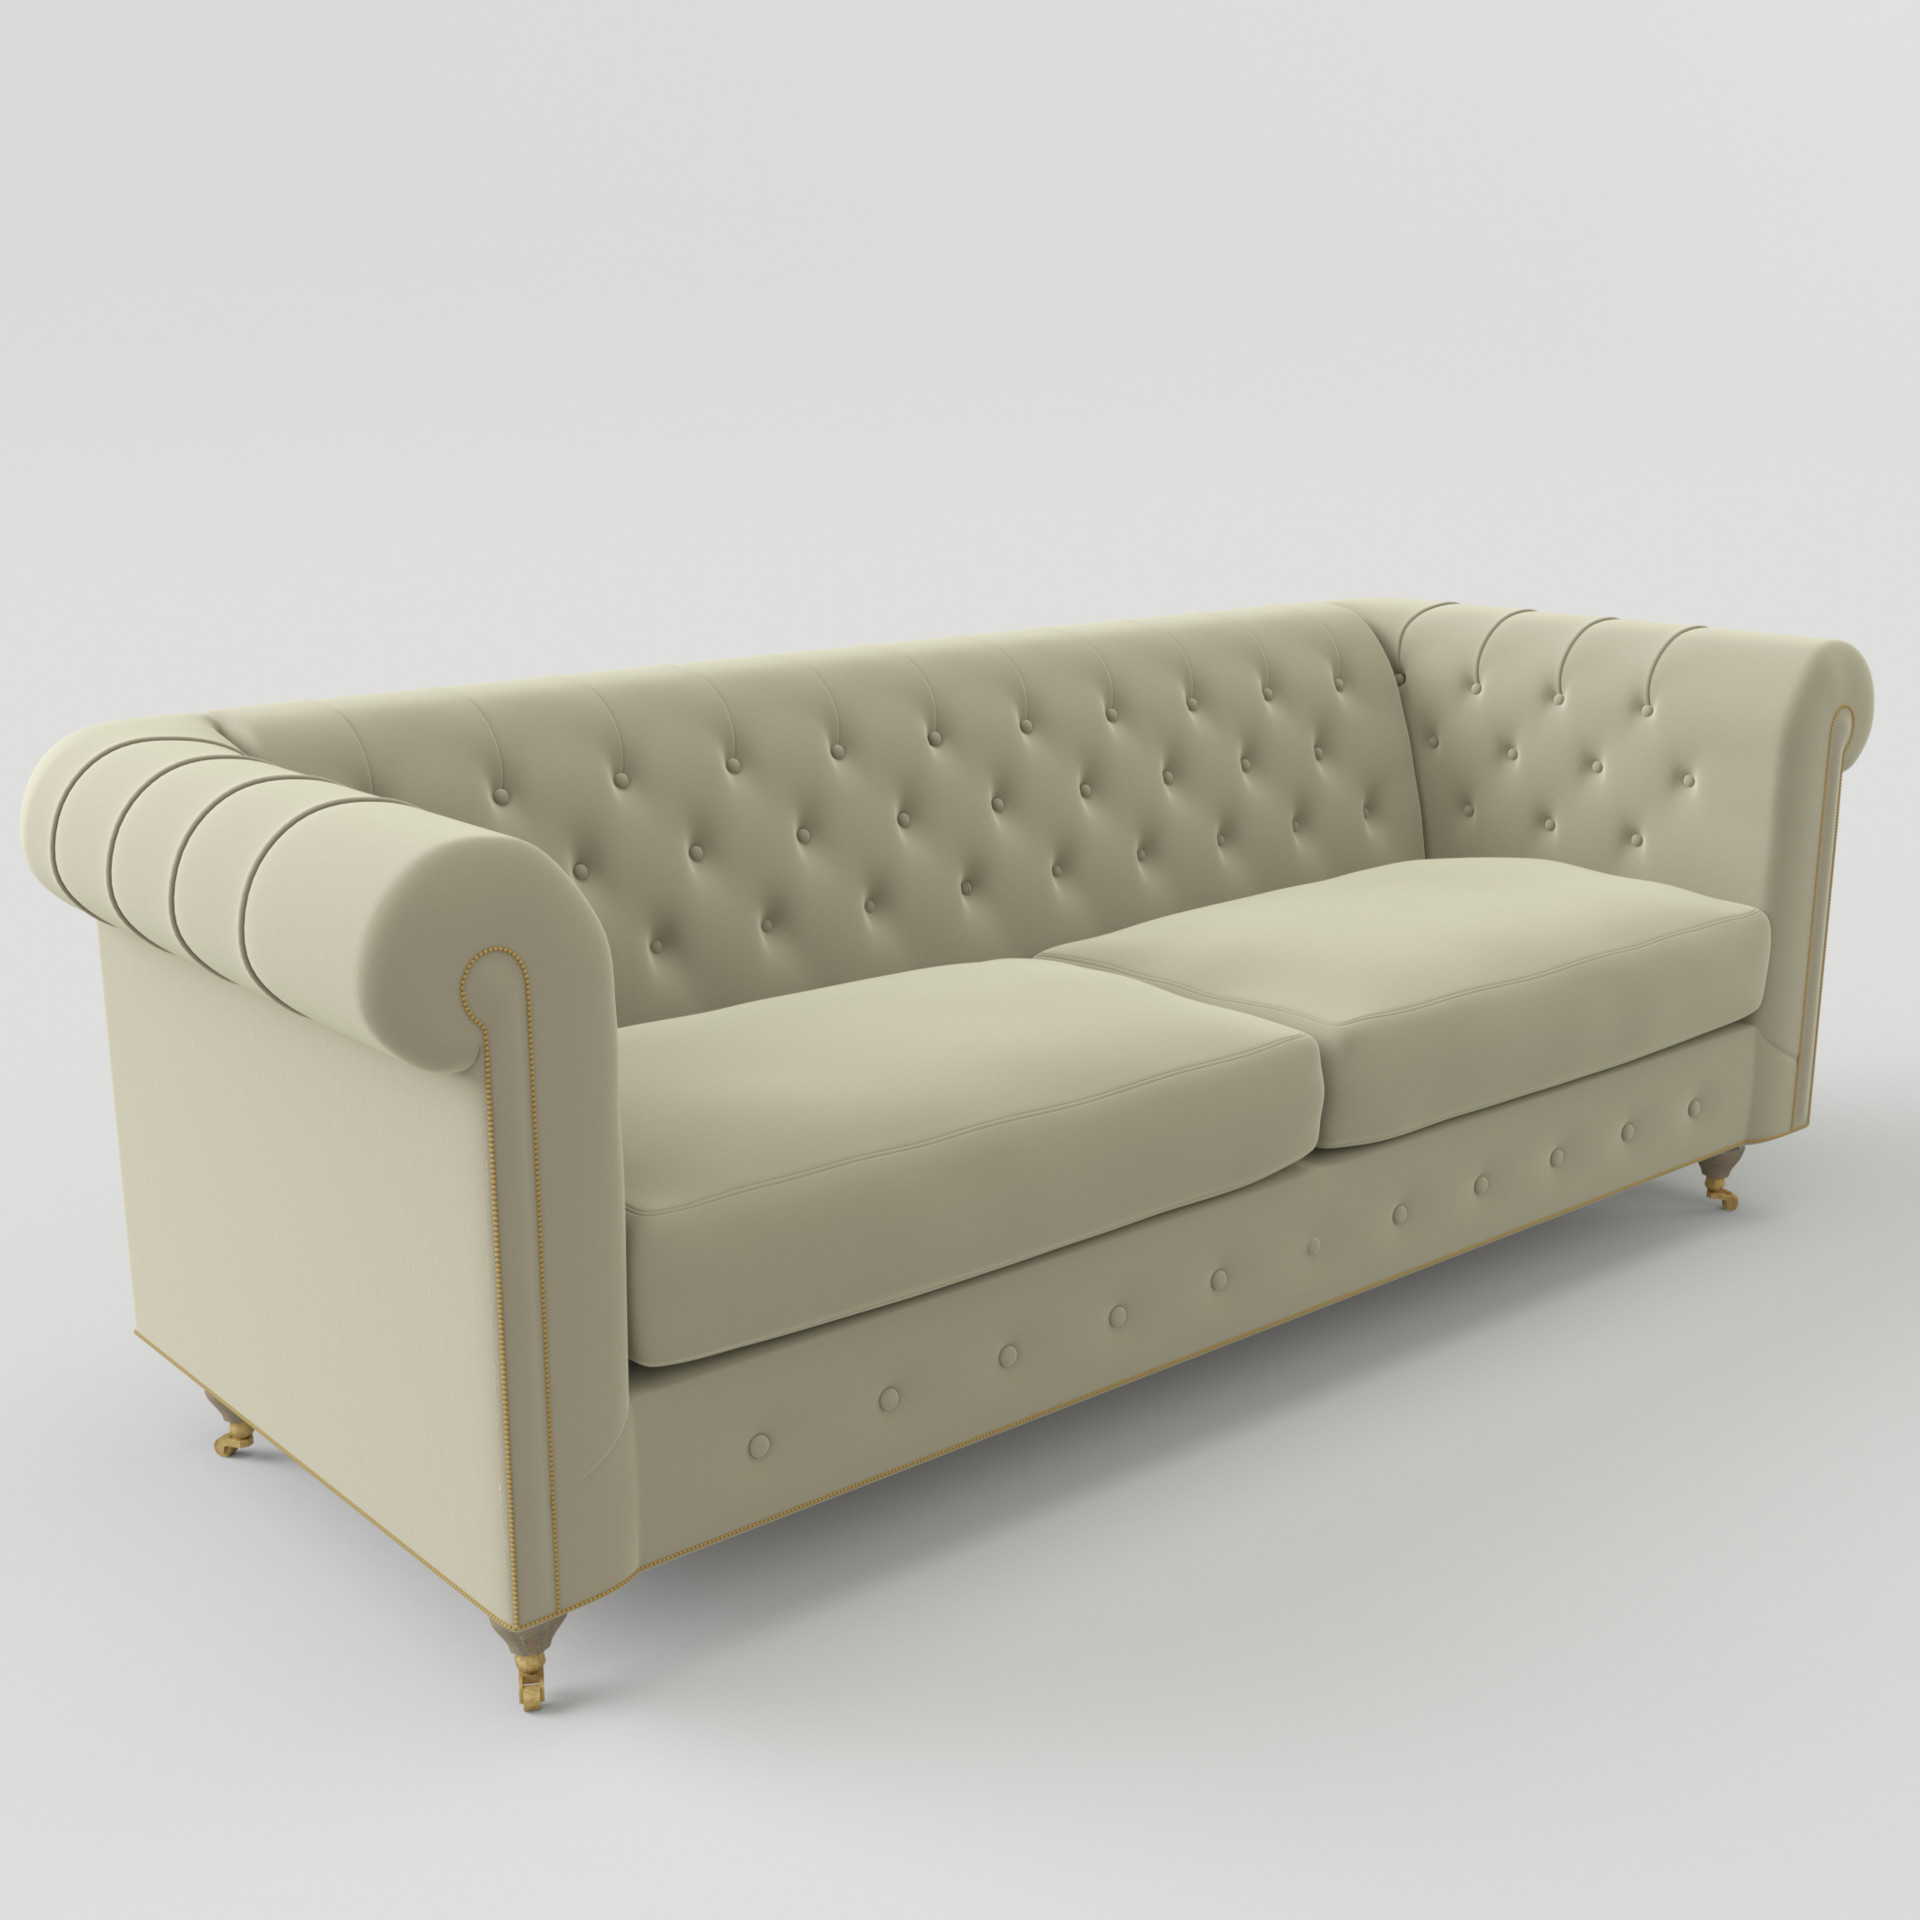 arte m couch